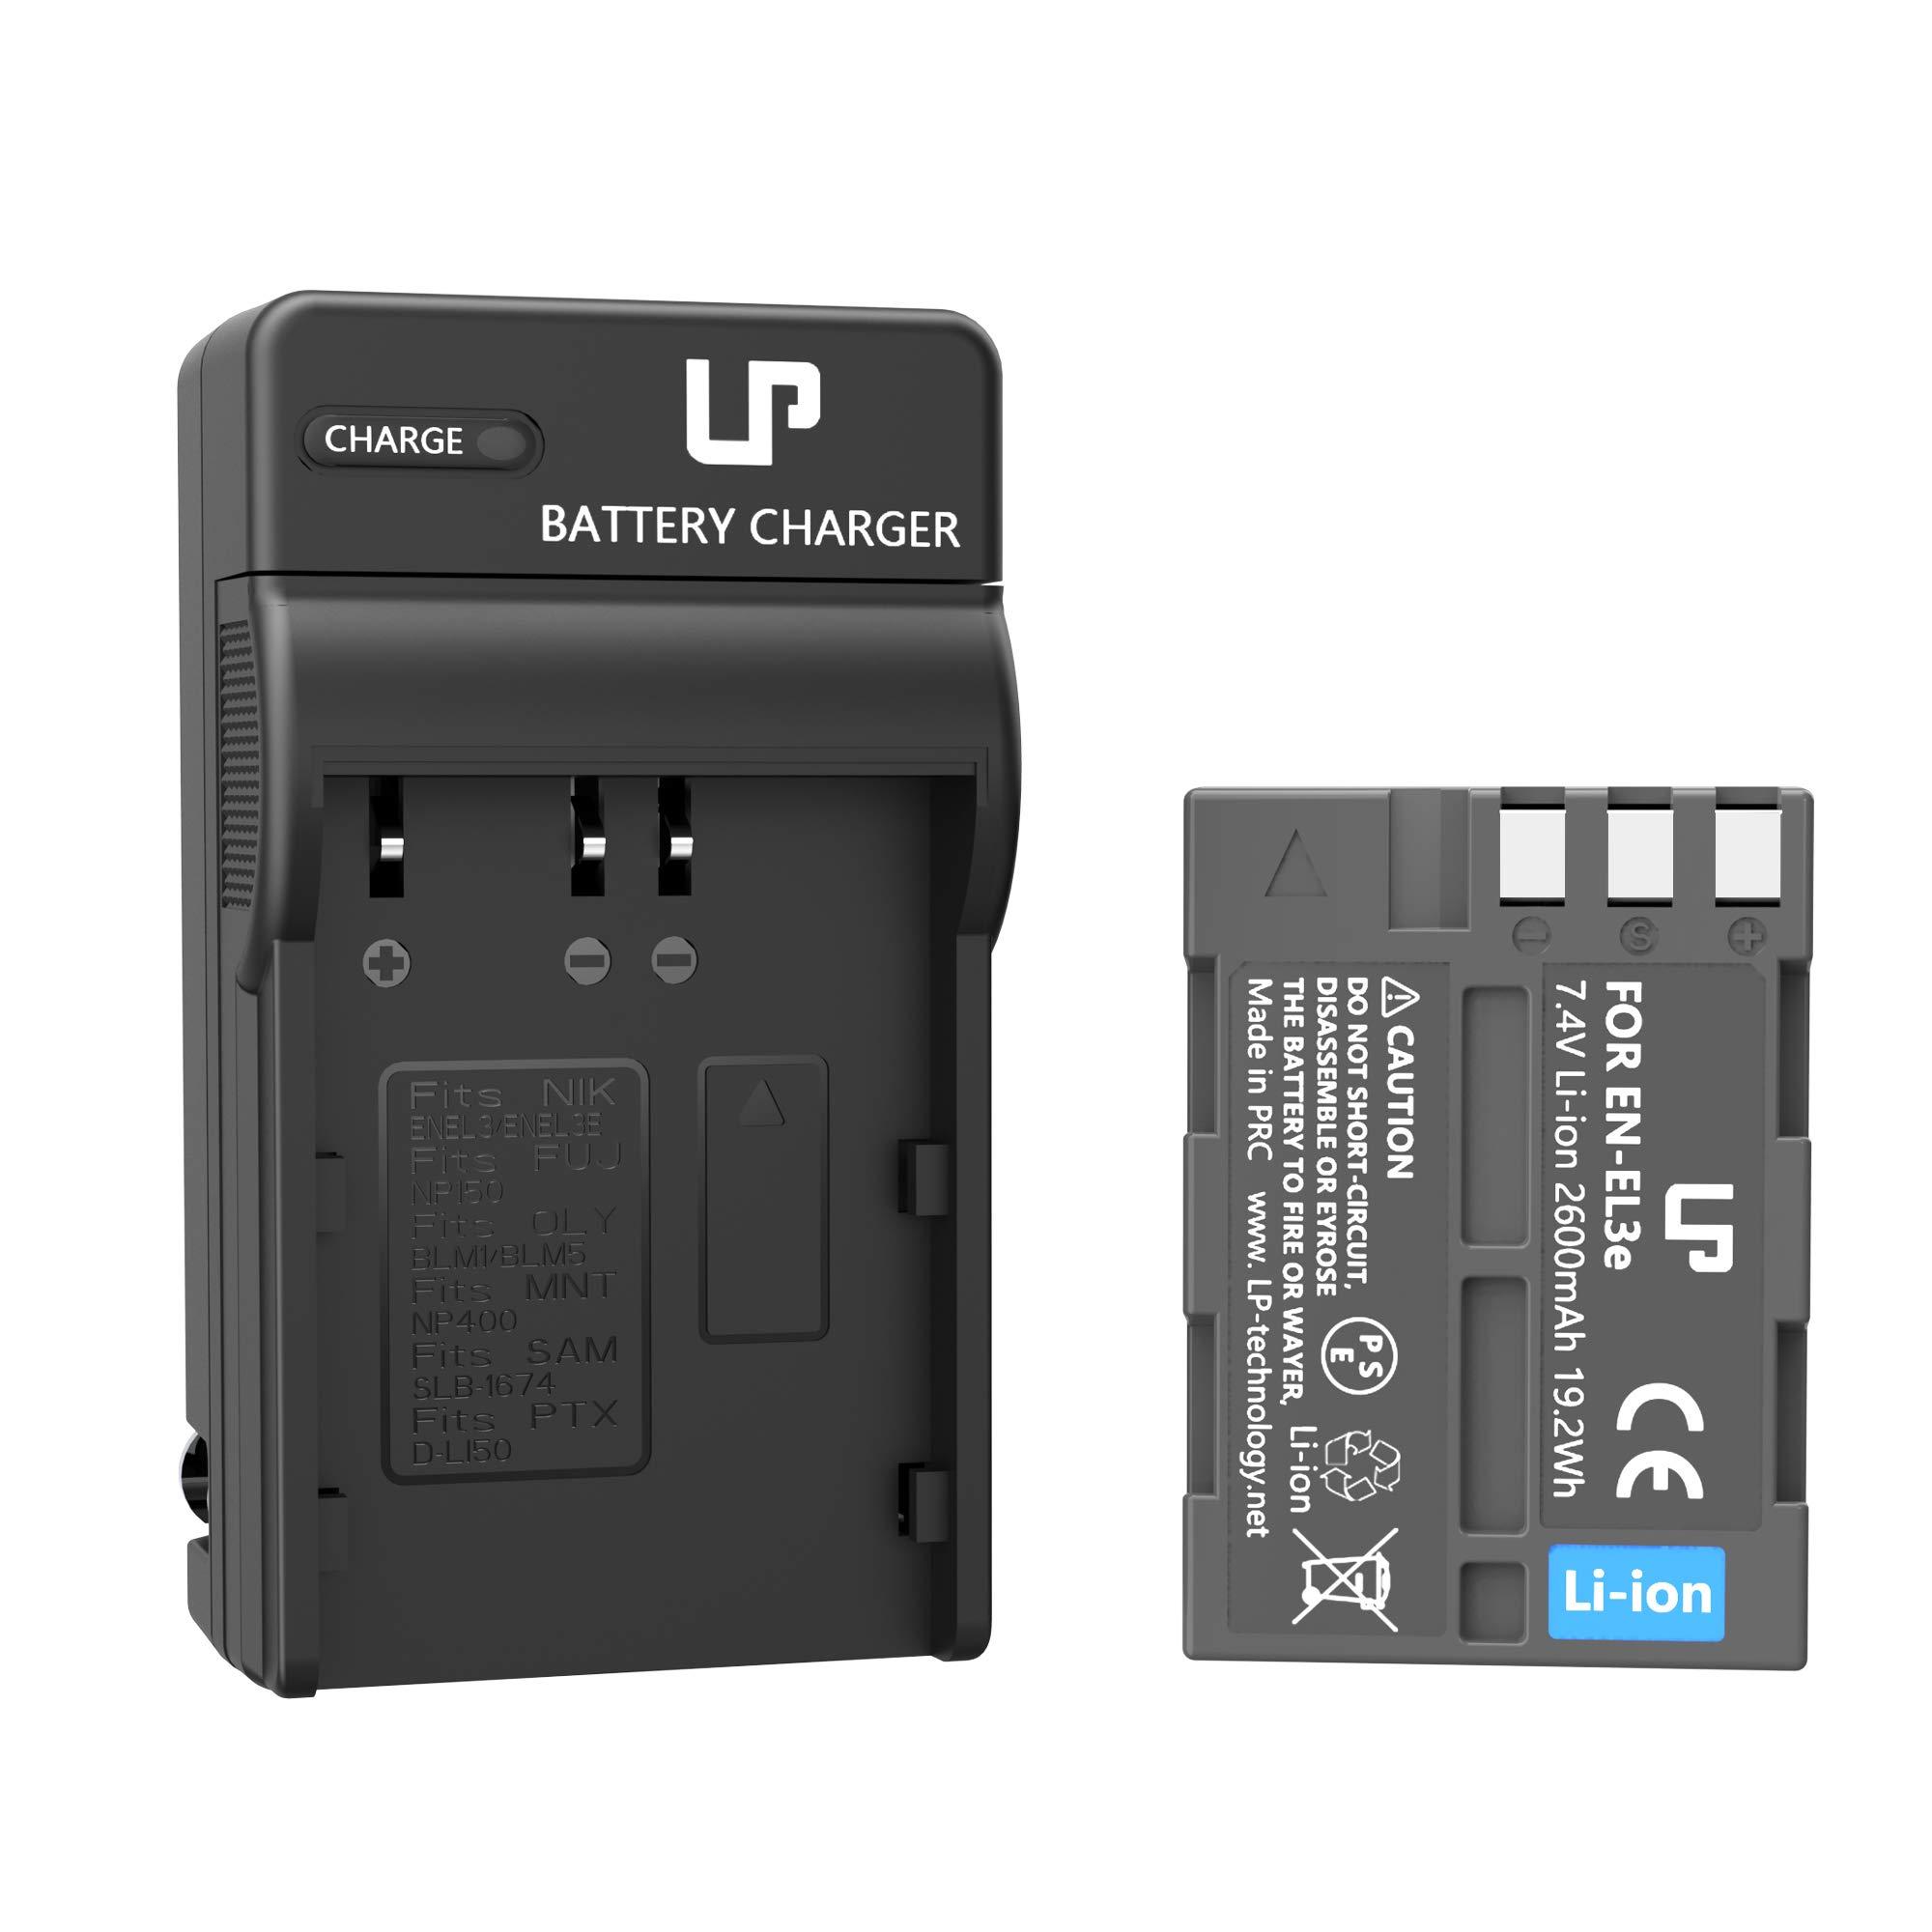 LP EN-EL3e Battery Charger Set, Compatible with Nikon D50, D70, D70s, D80, D90, D100, D200, D300, D300s, D700 & More, Replacement for Nikon EL3, EL3a by LP